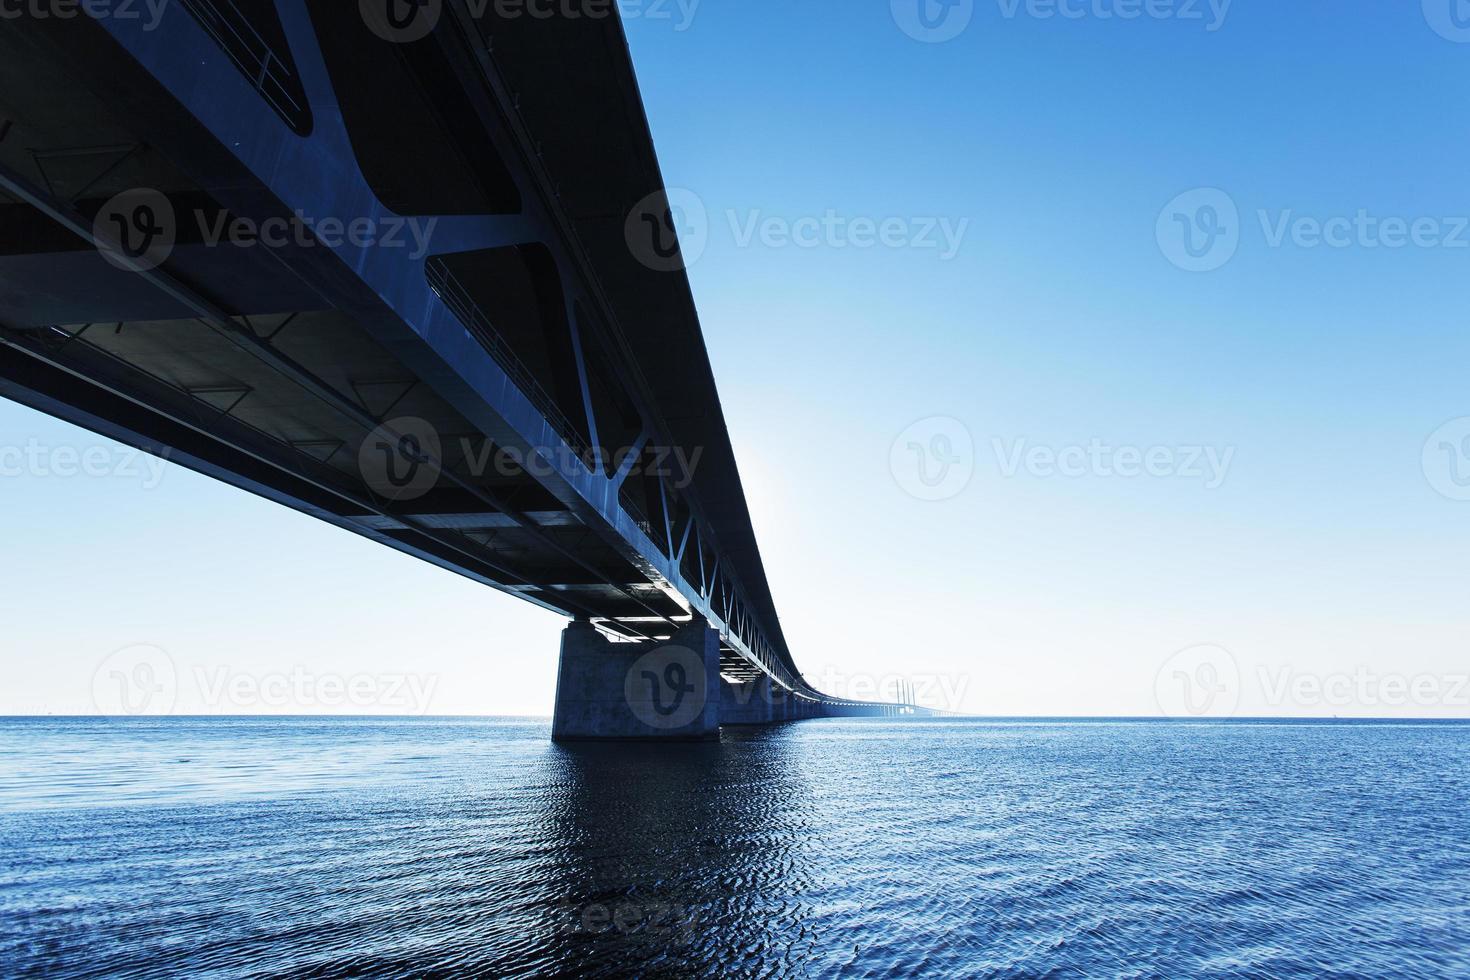 Oresund Bridge,oresunds bron, bridge on the sea , photo